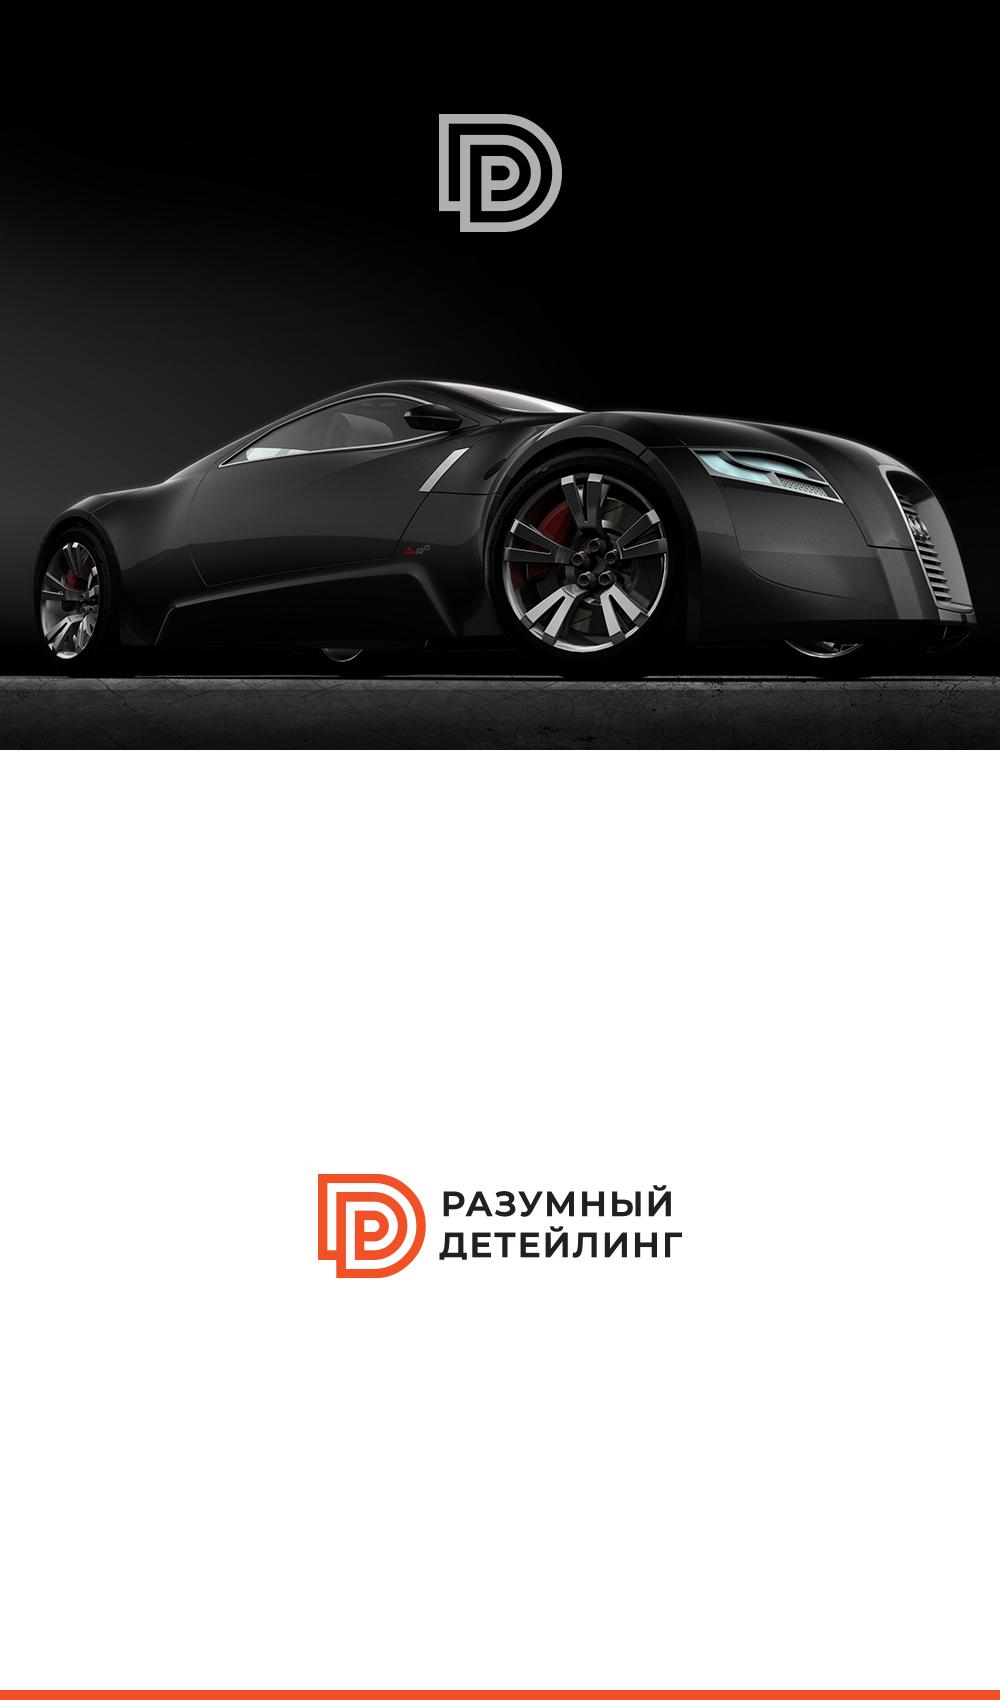 Ребрендинг логотипа  фото f_8705ae28057e482c.jpg